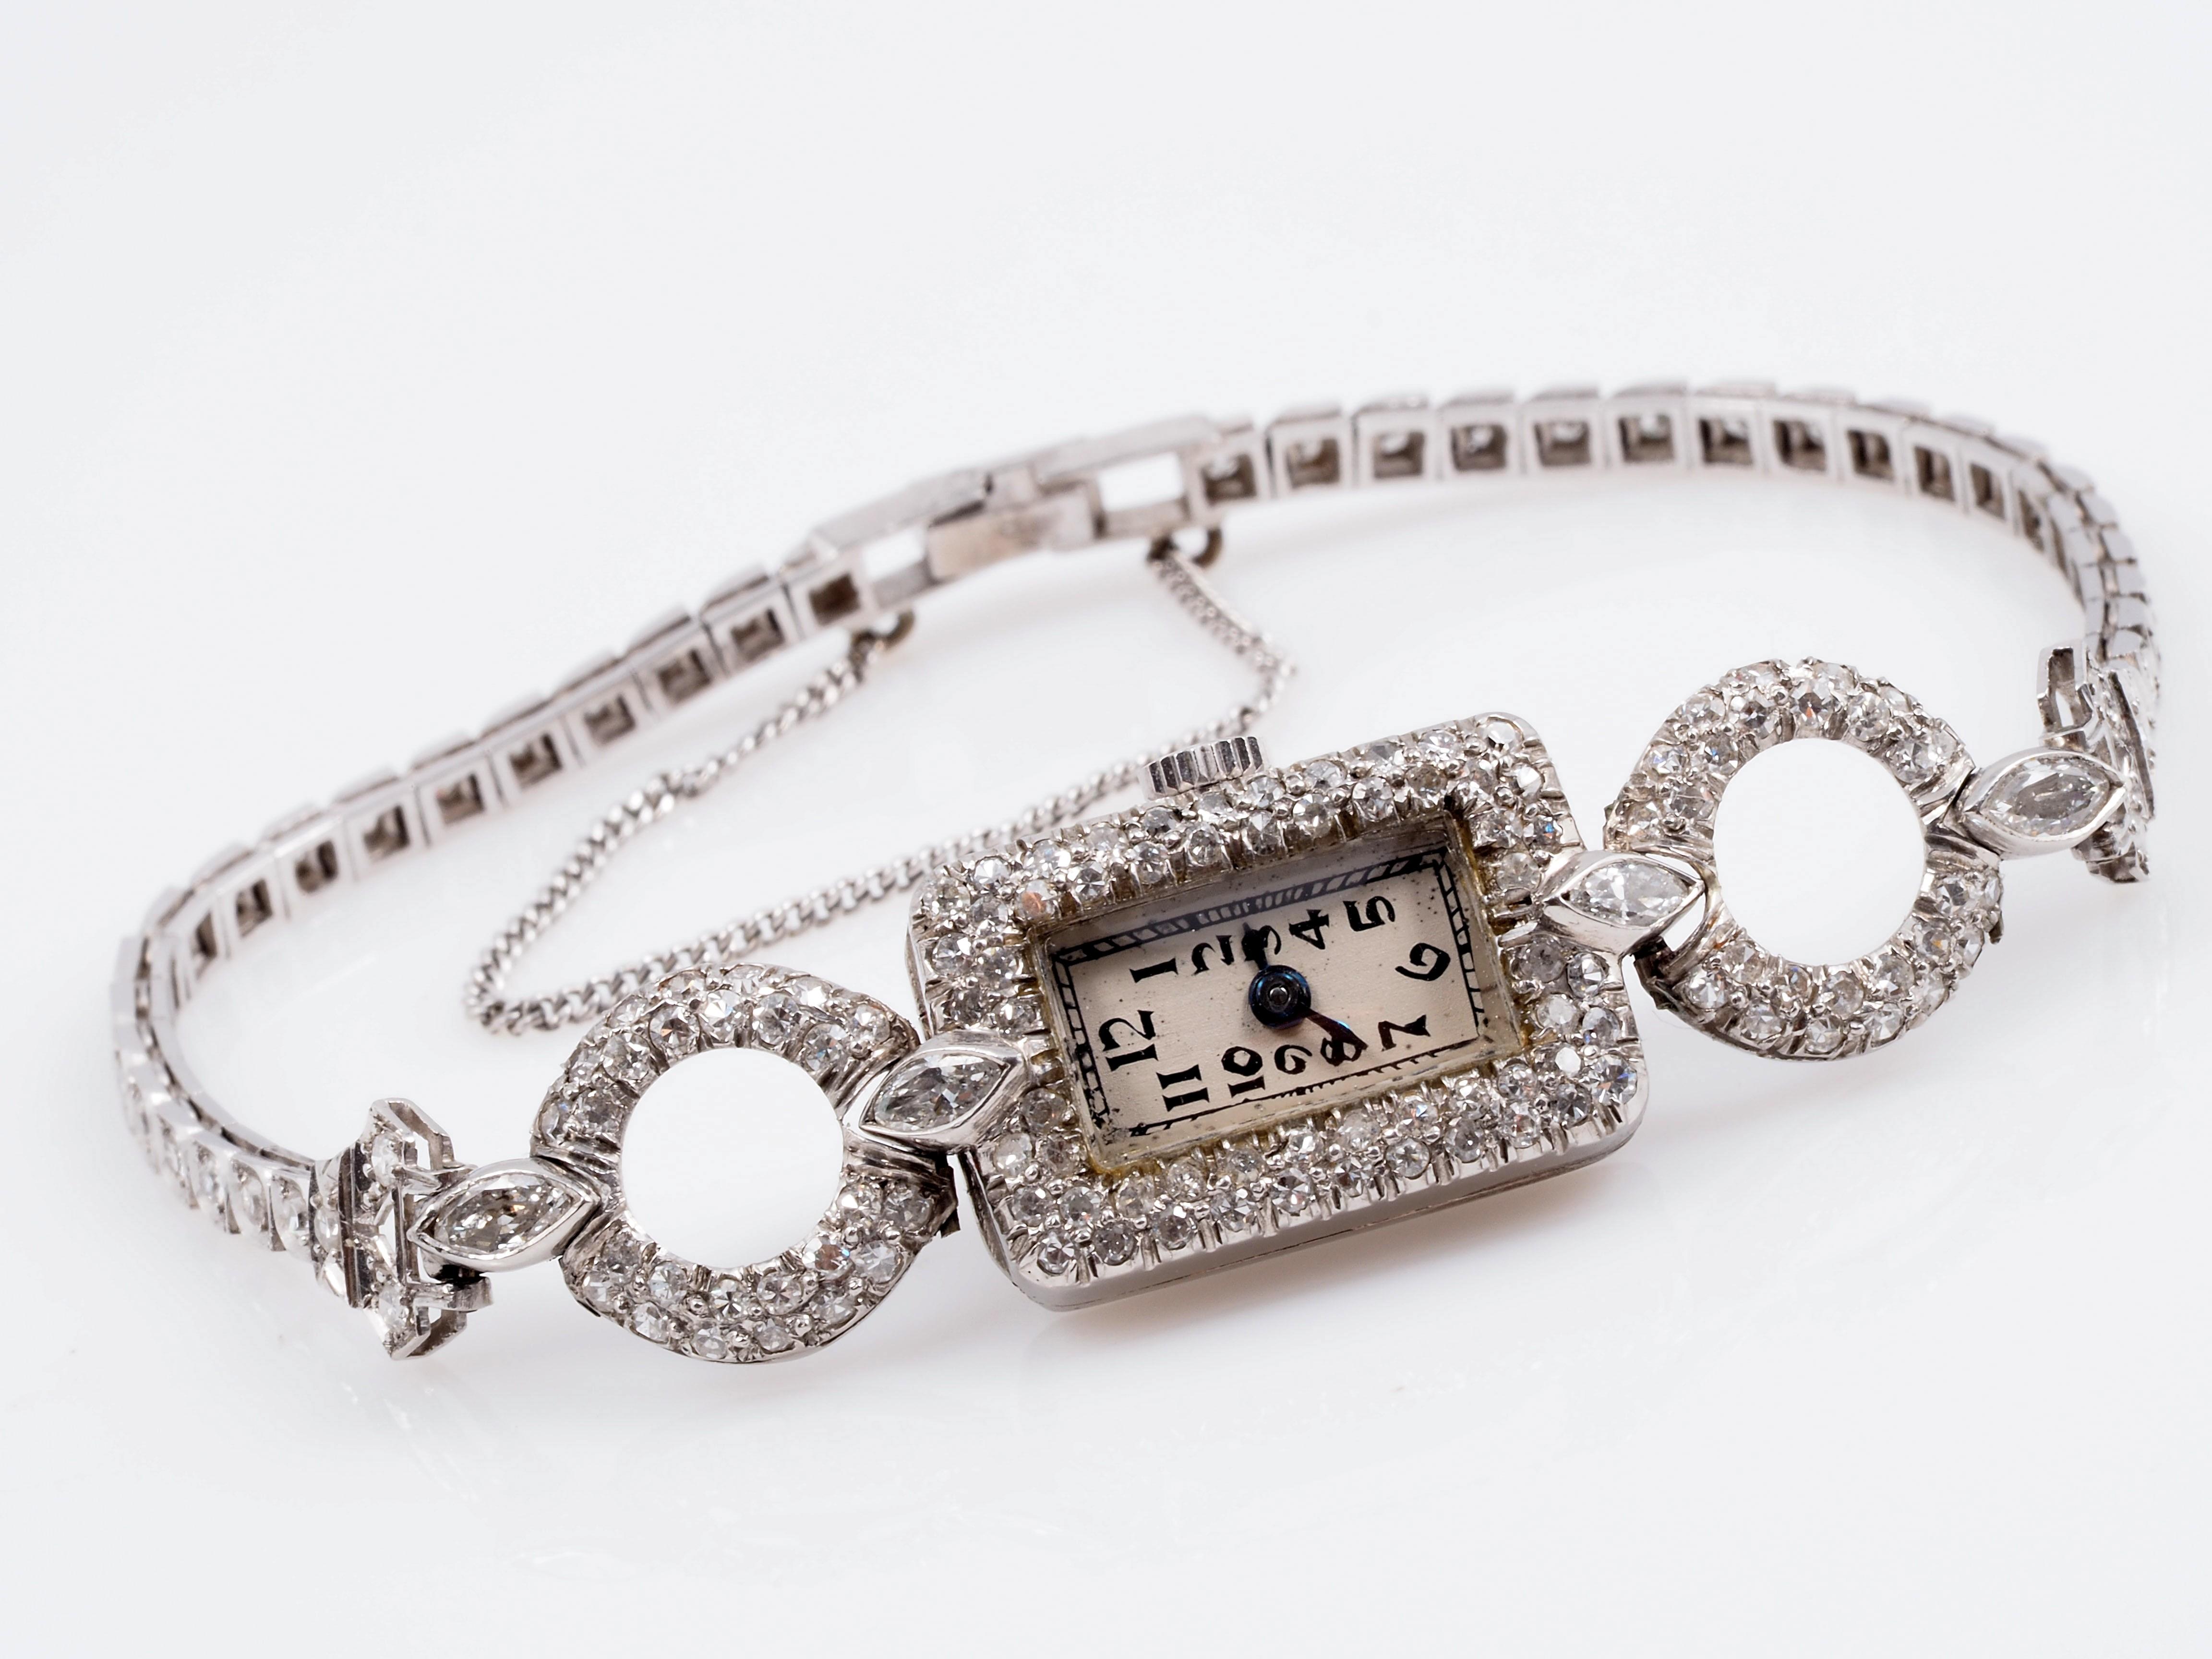 antike damen armband uhr mit 2 00 karat diamanten platin um 1920 ebay. Black Bedroom Furniture Sets. Home Design Ideas